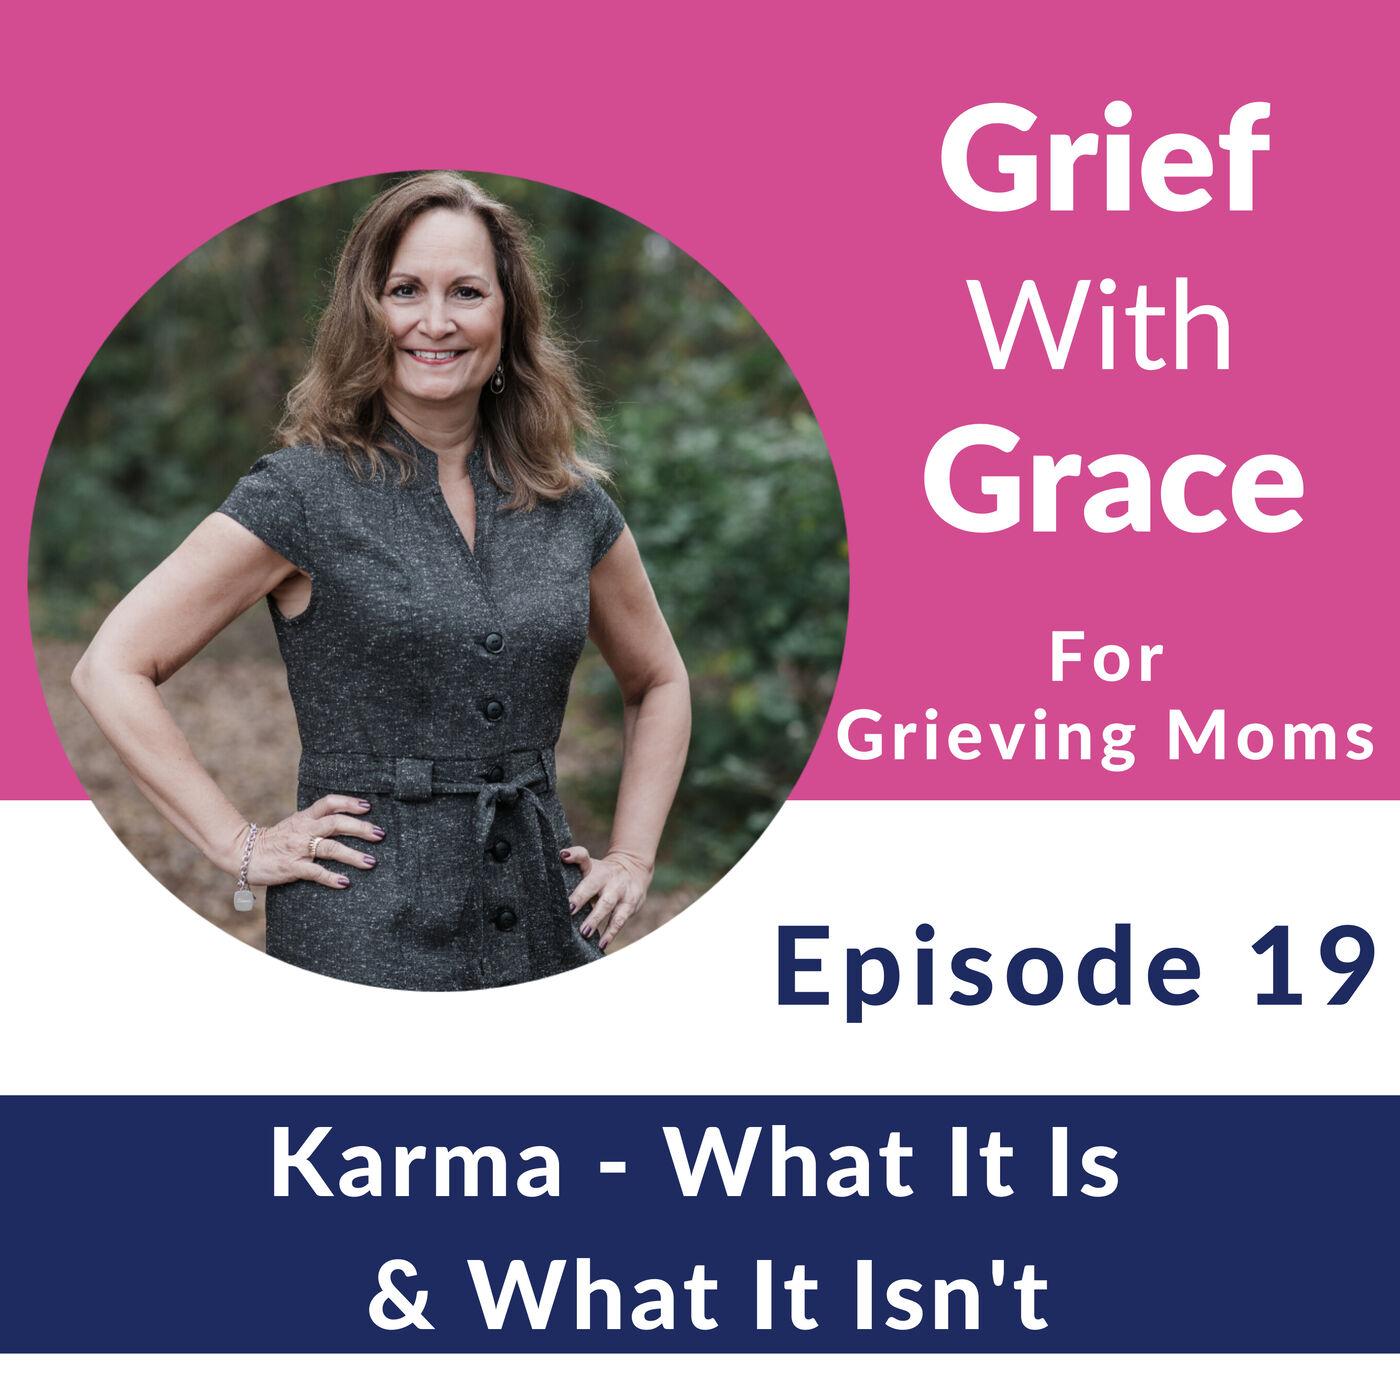 19. Karma - What It Is & What It Isn't